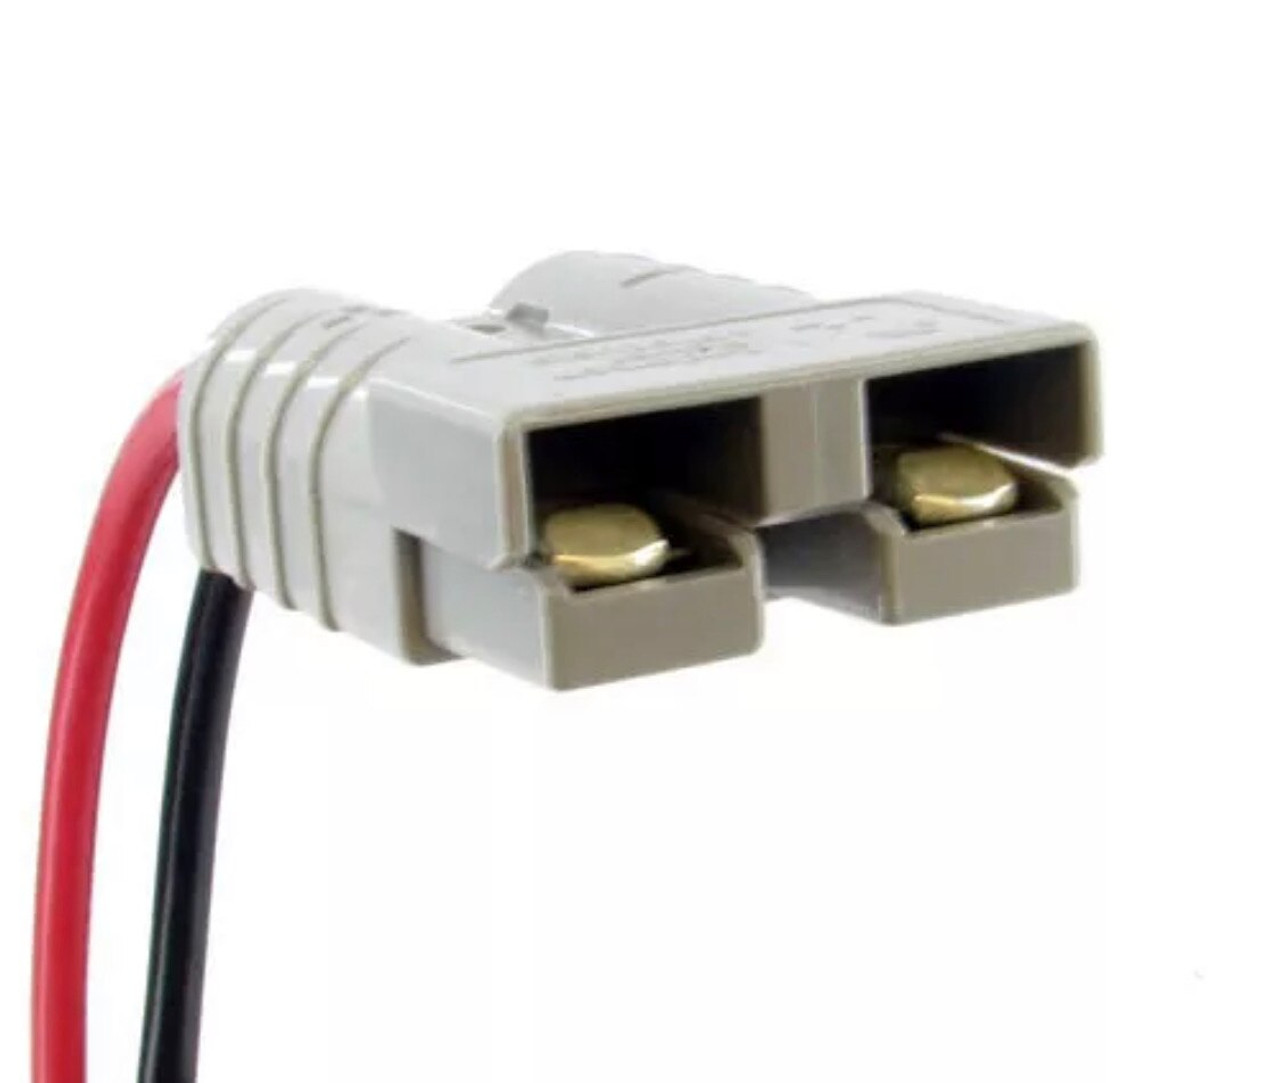 Raion Power RBC7P Wiring Harness Connector For APC RBC7P UPS Unit